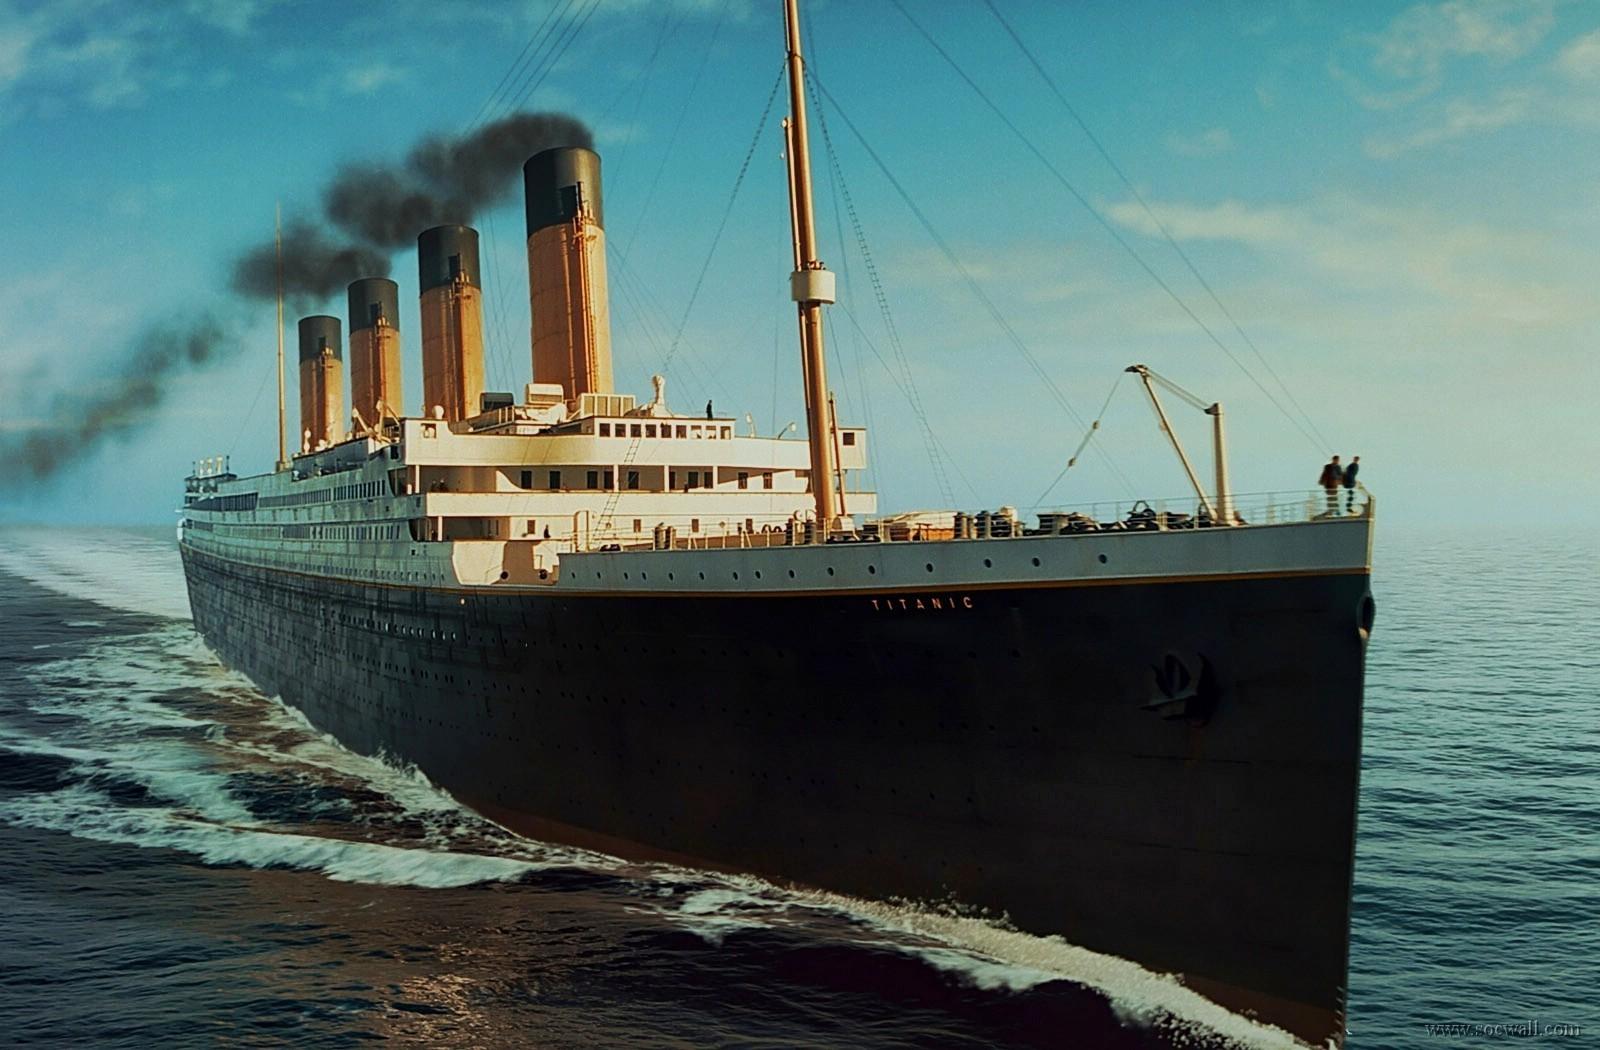 titanic - photo #48